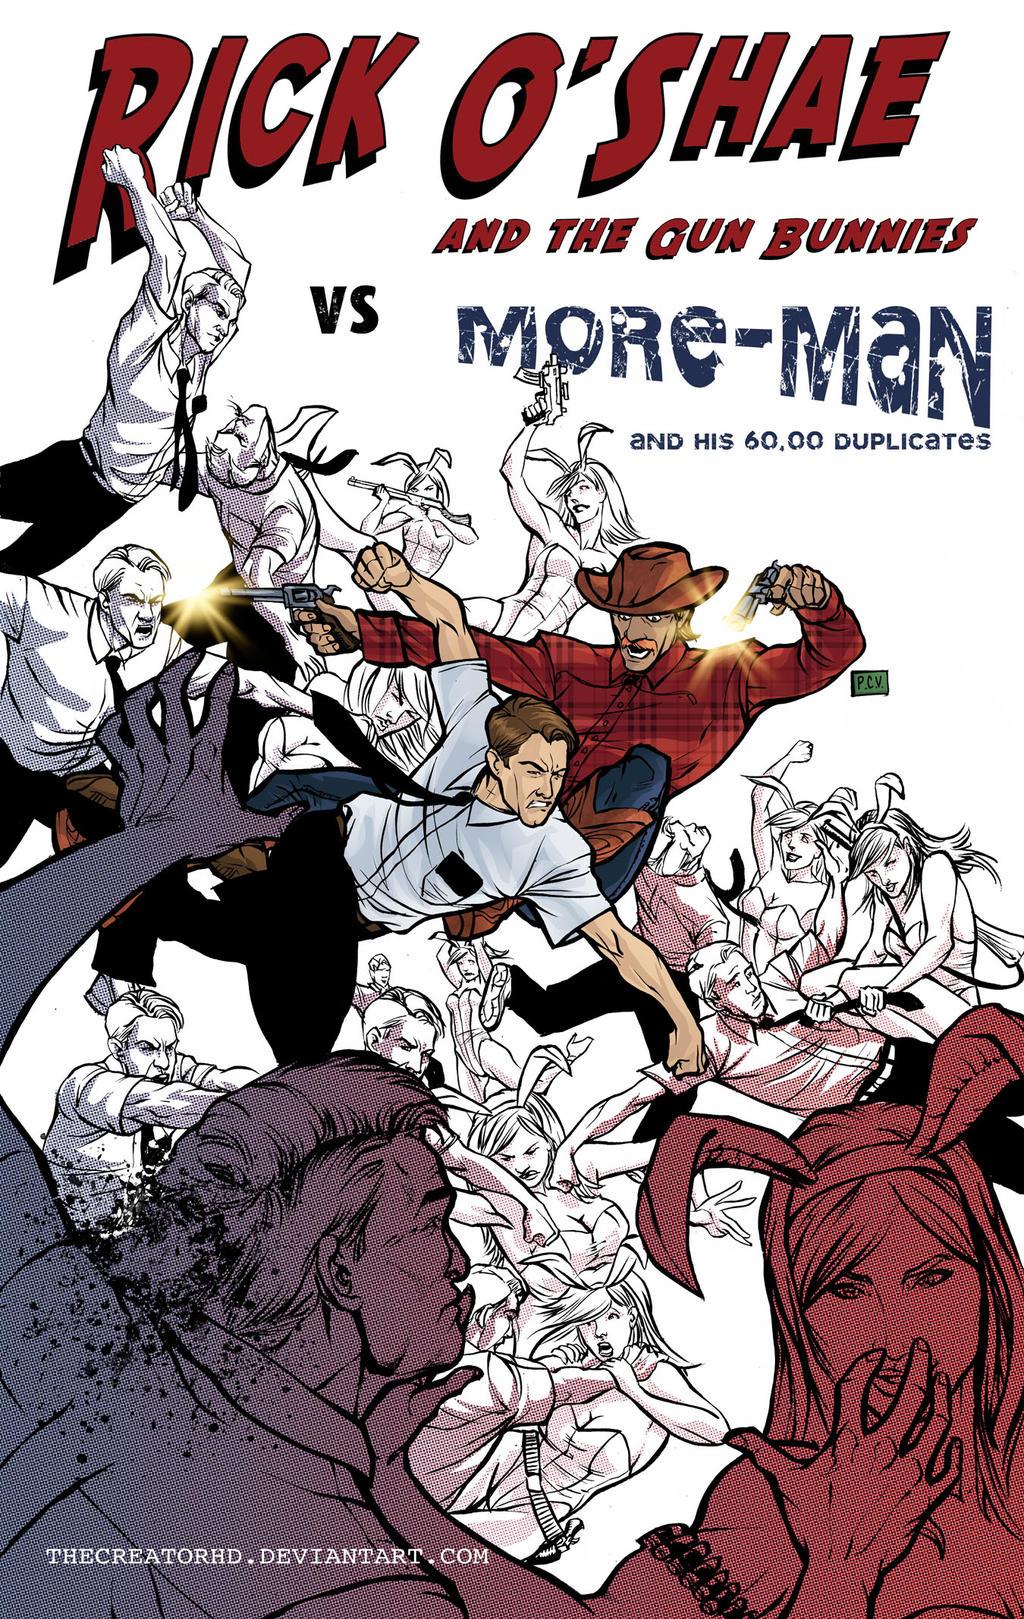 Rick O'Shae vs More-Man by thecreatorhd